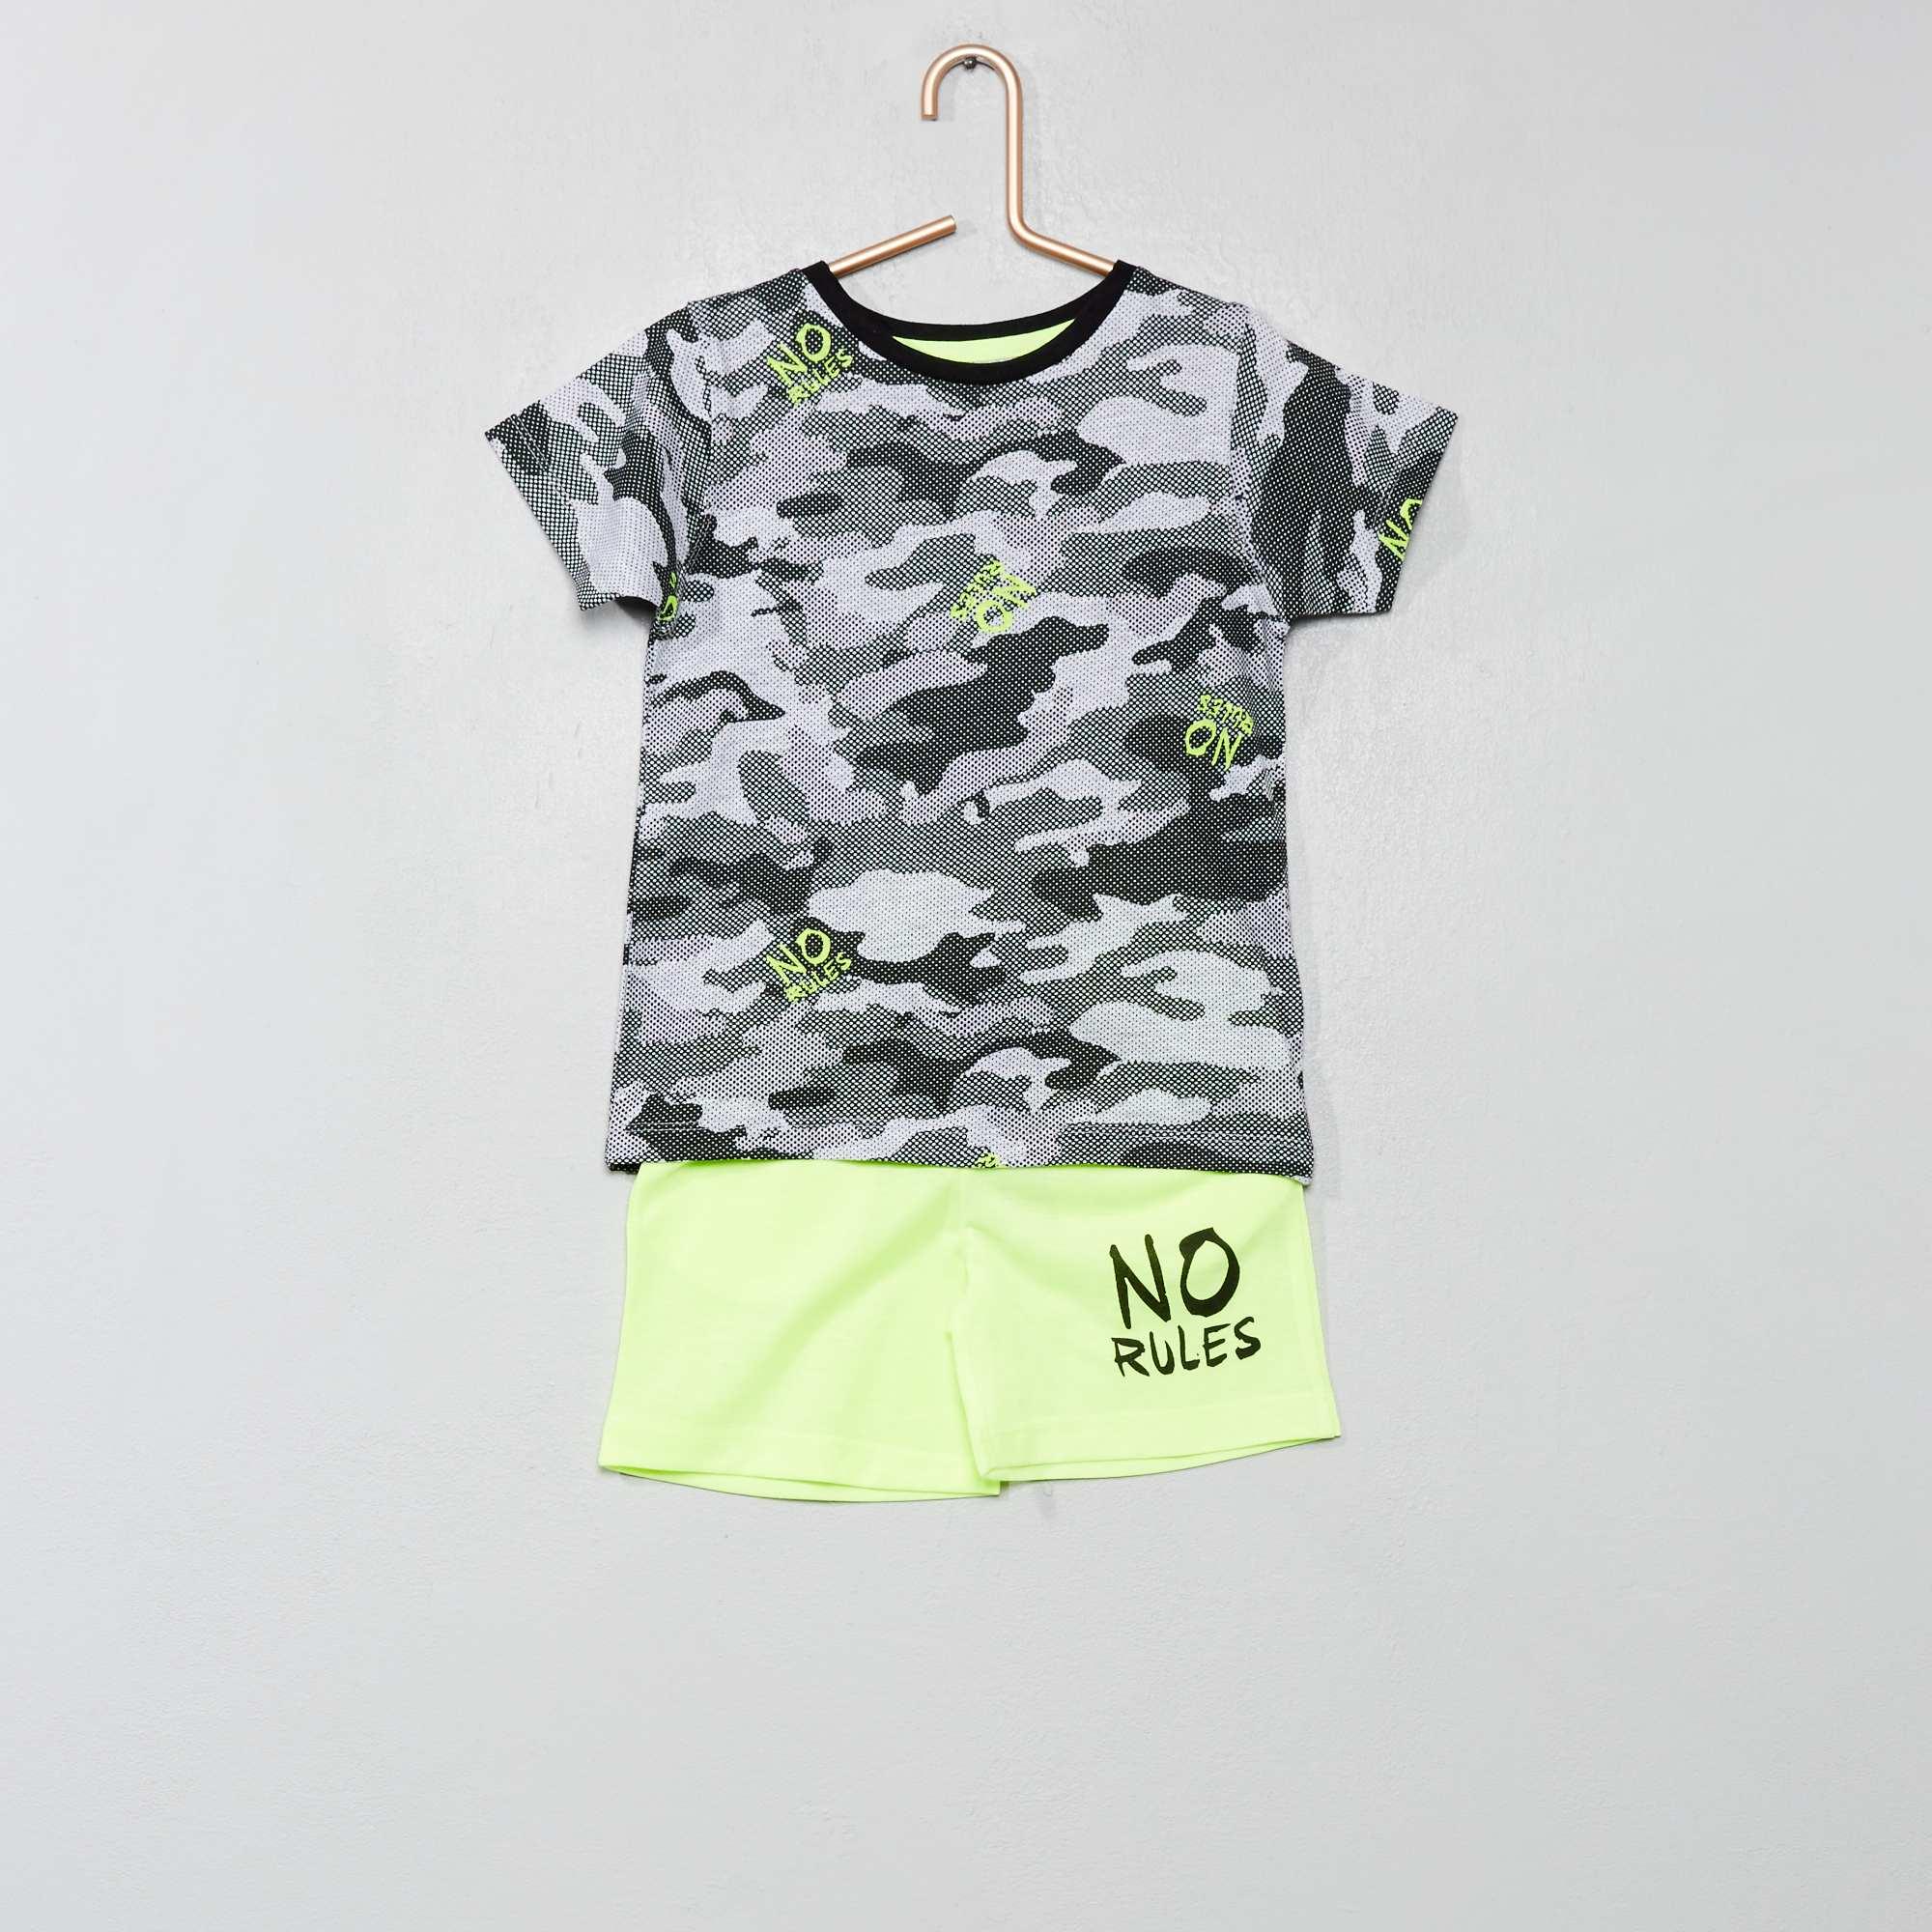 df4f52b8a5aa0 Ensemble t-shirt camouflage + short Garçon - vert - Kiabi - 14